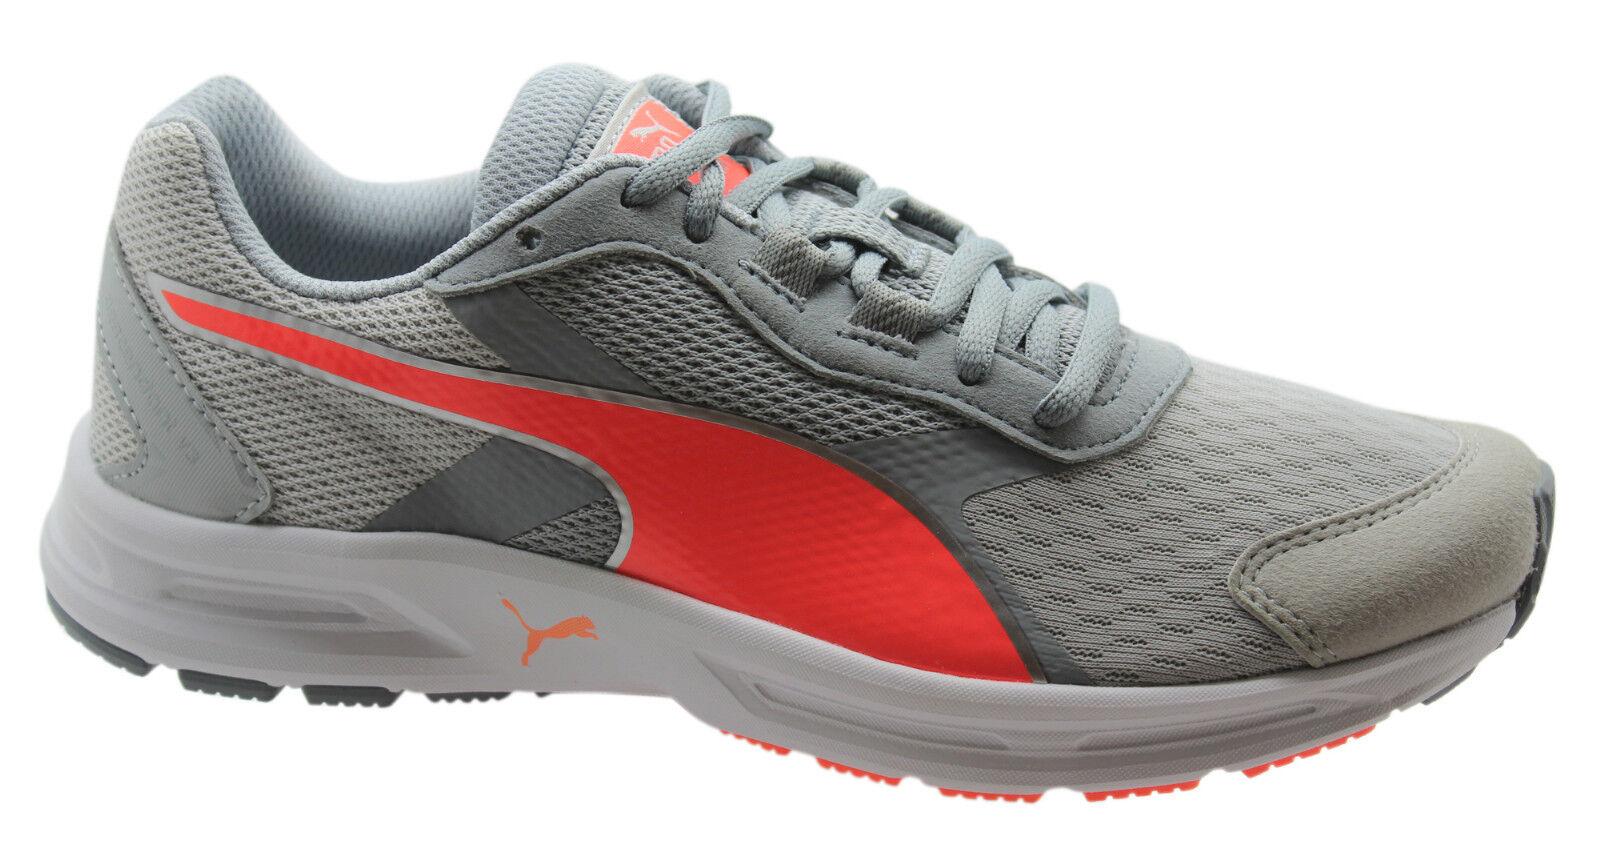 5b12b515592d Puma Descendant V3 Womens Trainers Running Shoes Grey Lace Up 188166 ...